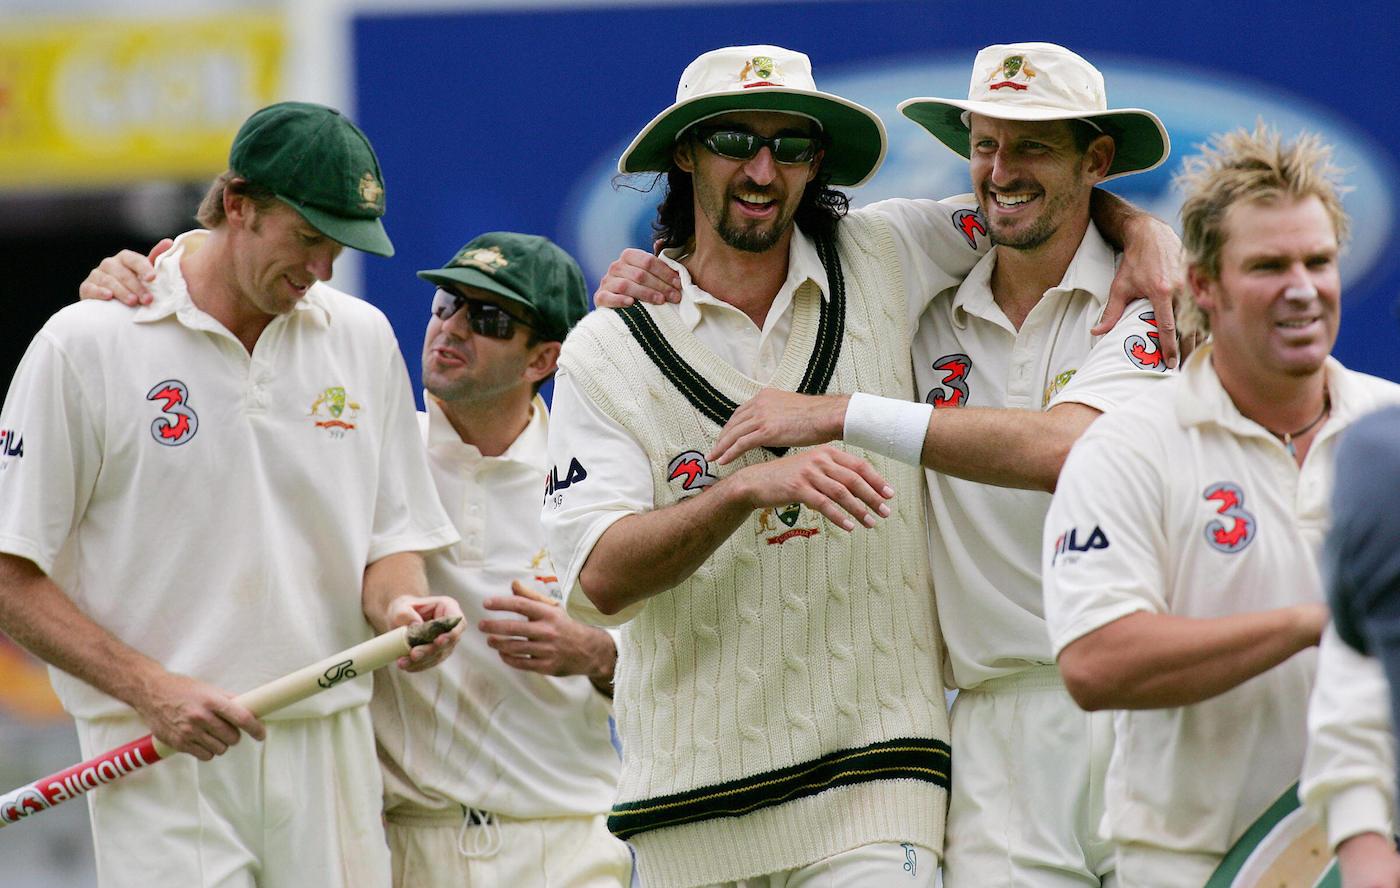 Glenn McGrath, Ricky Ponting, Jason Gillespie, Michael Kasprowicz and Shane Warne celebrate as Australia demolishes New Zealand